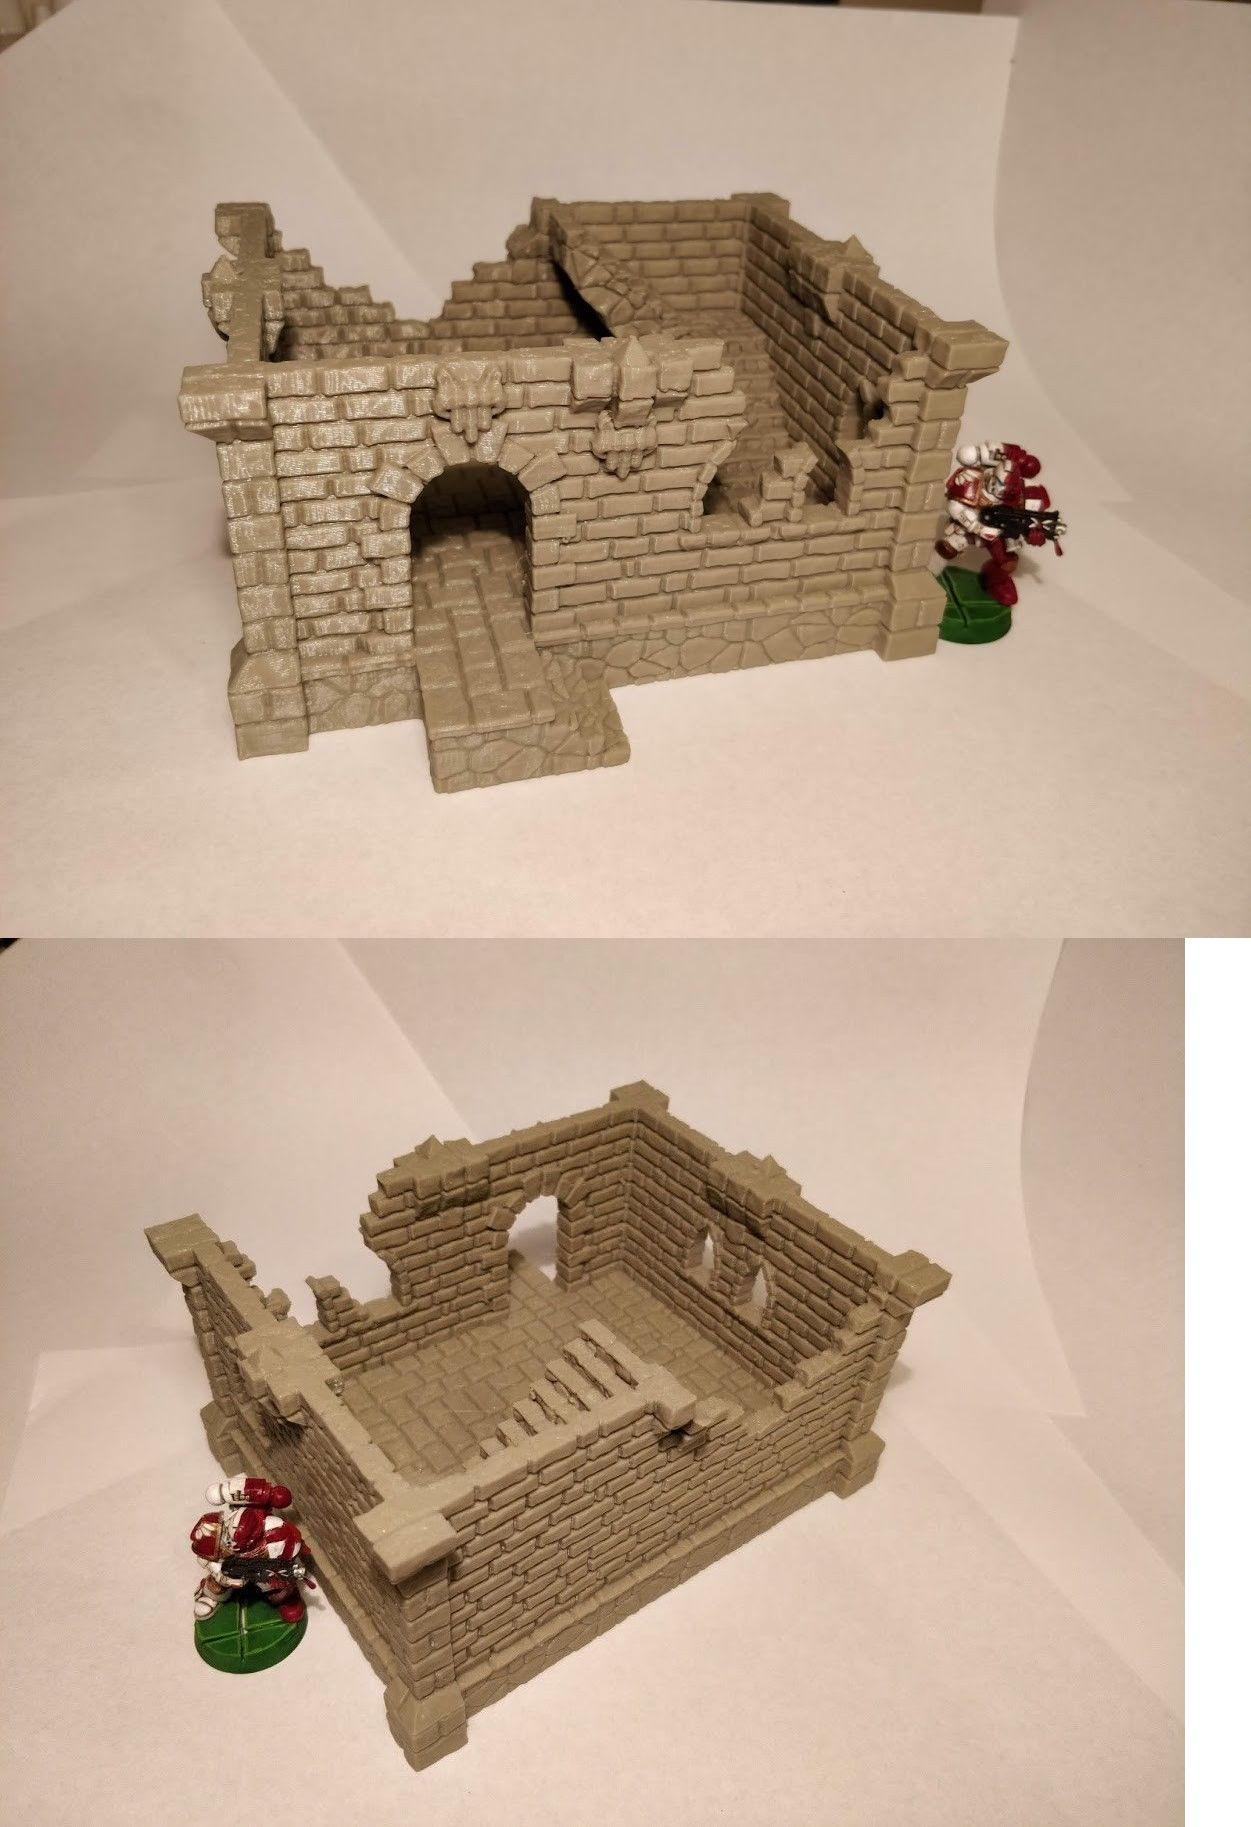 Terrain and Scenery 177640: Fantasy Castle Ruins 40K Star Wars